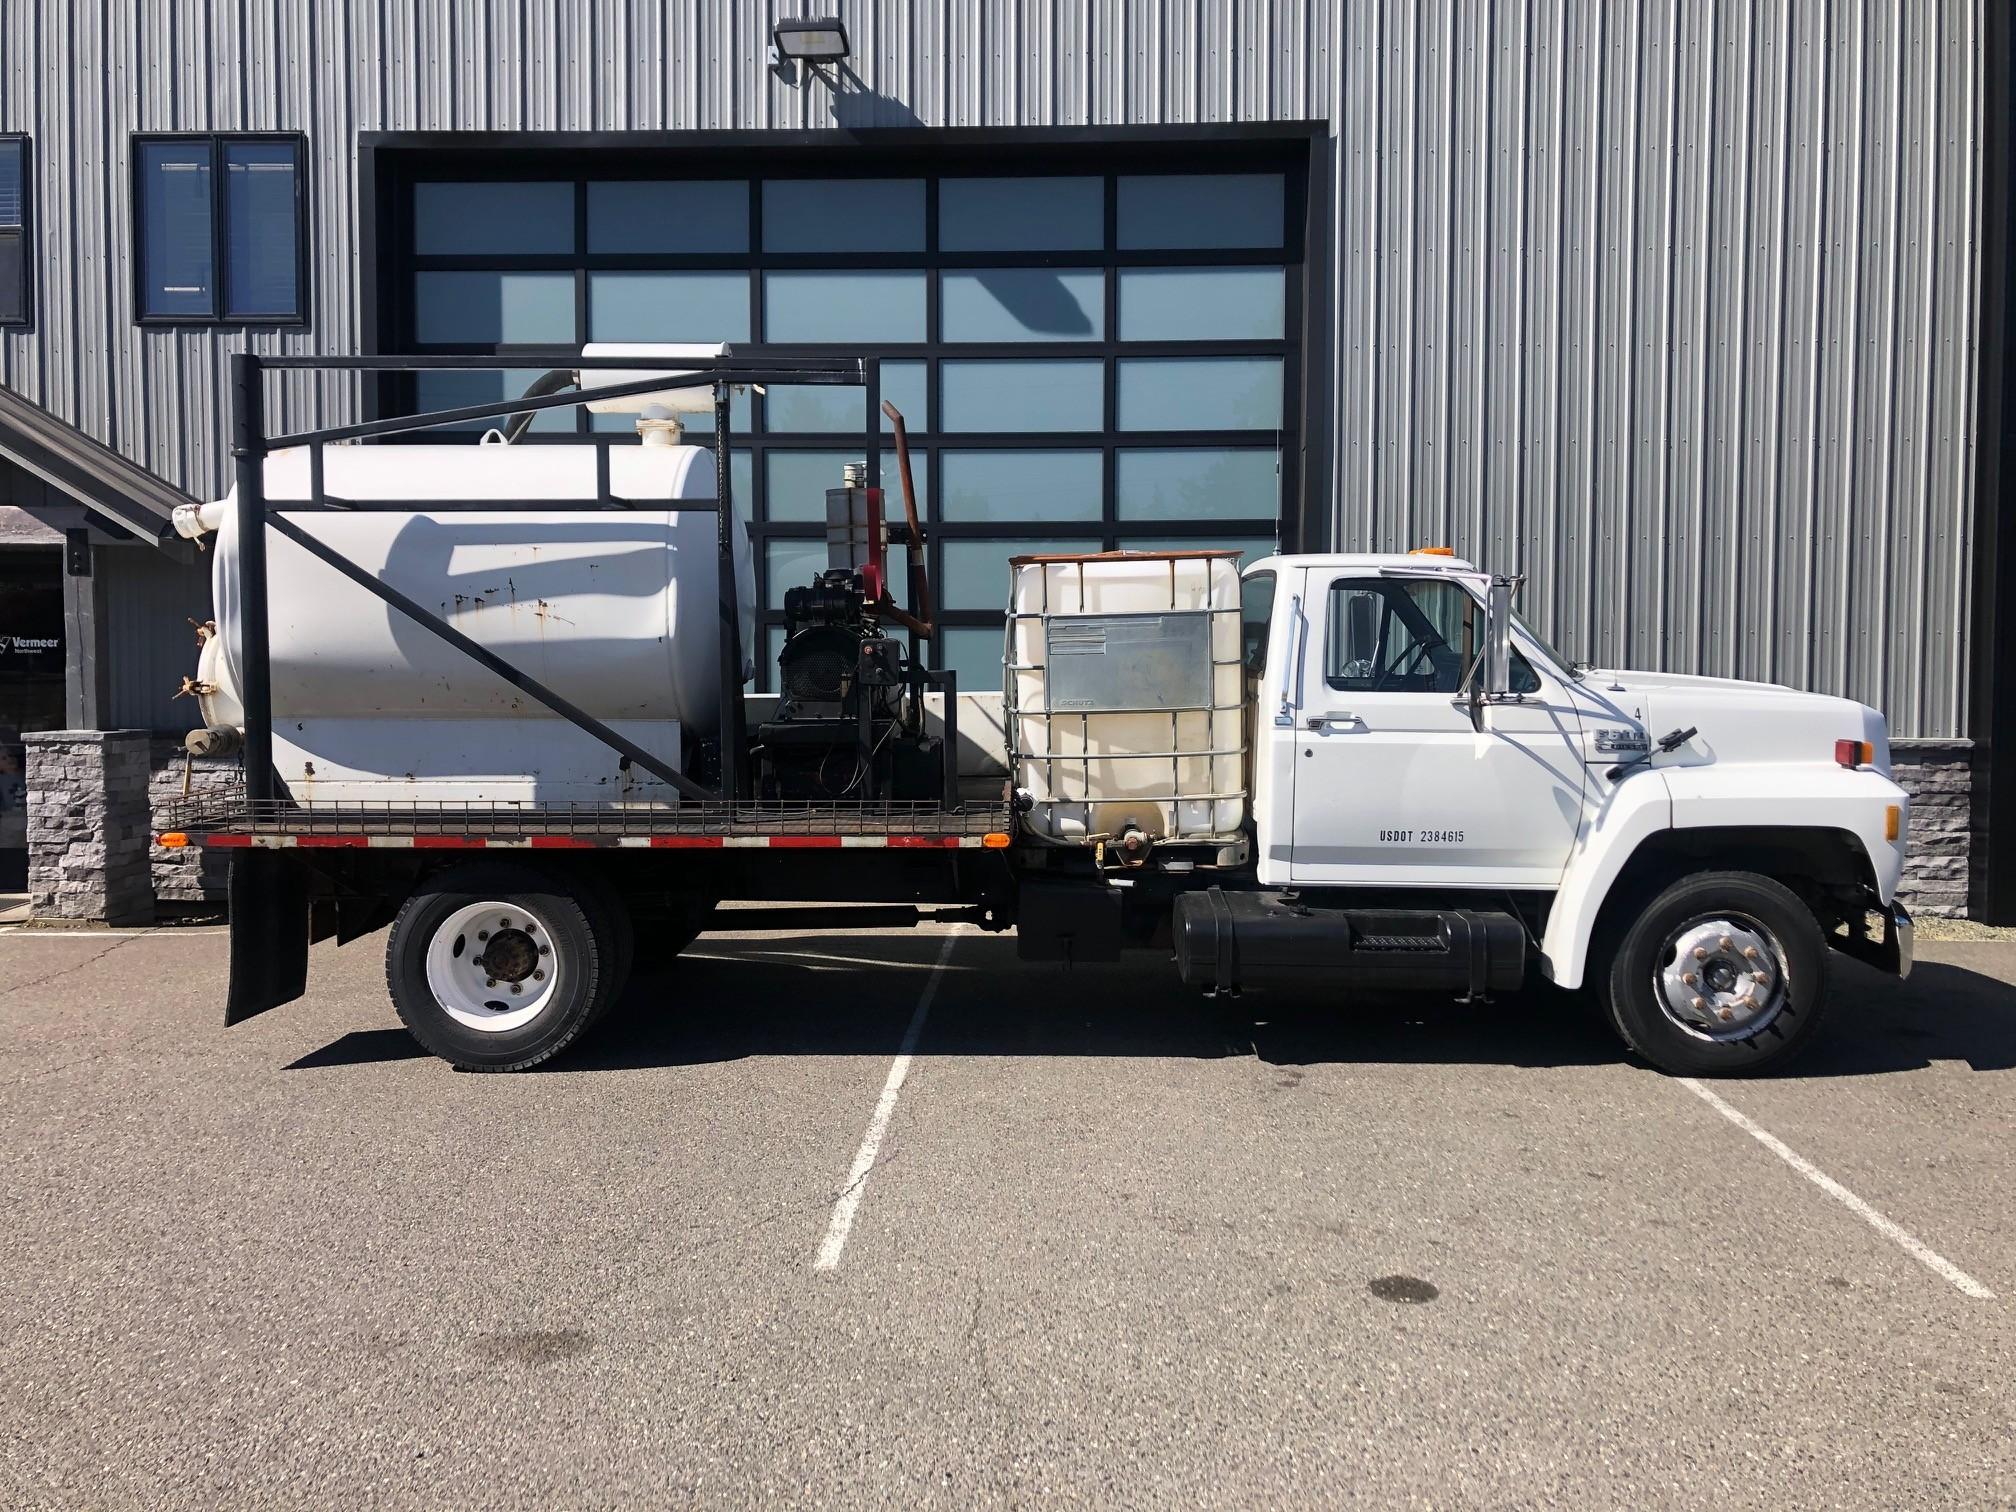 Used, 1993, Ford, F-600, Flatbed Trucks